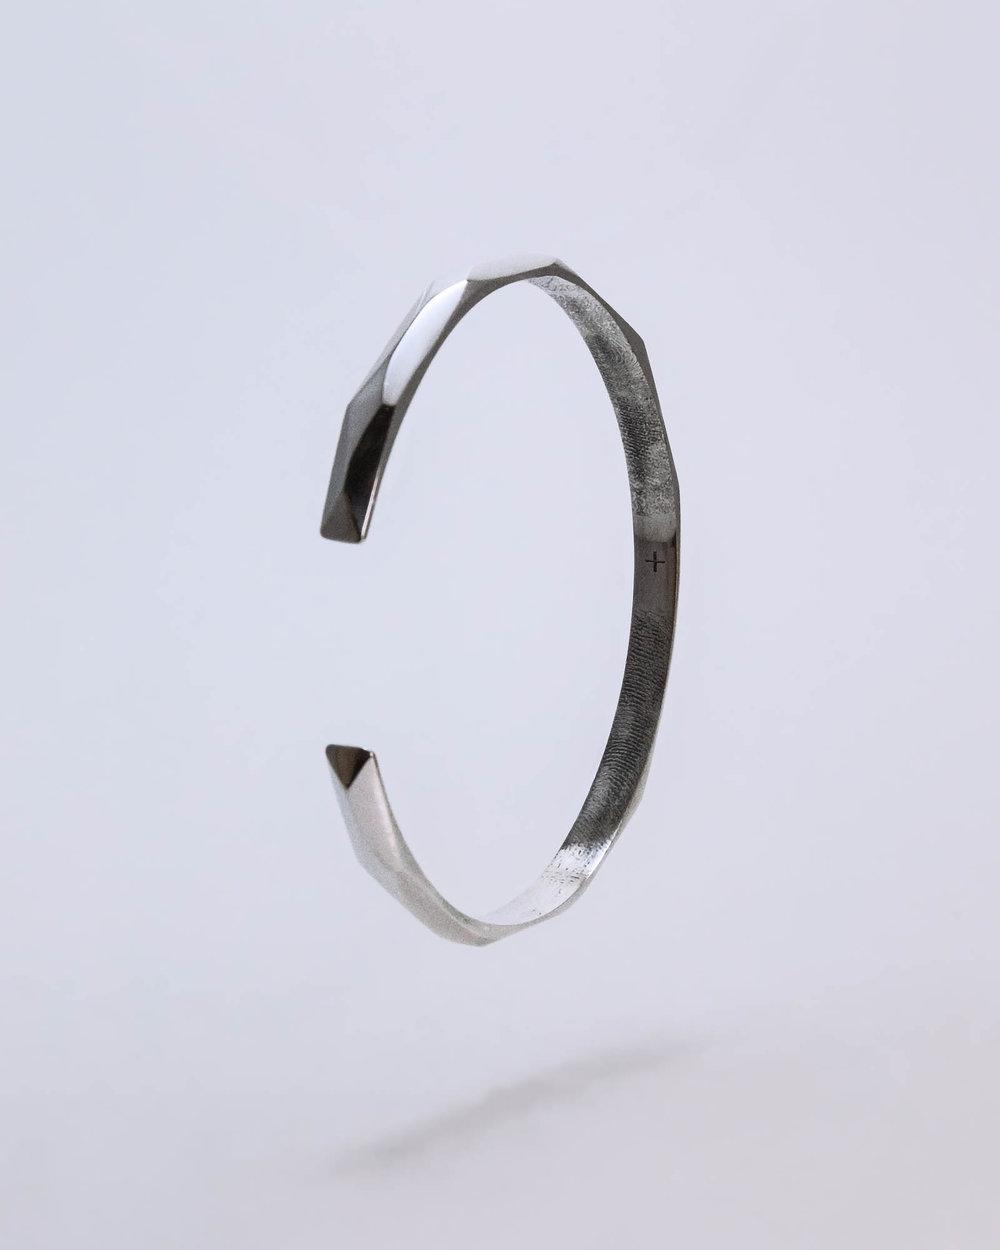 %22Facet Band Fingerprint (2)%22, Brian Kivuti (February 22, 2018) [web.v.2.Cropped].jpg